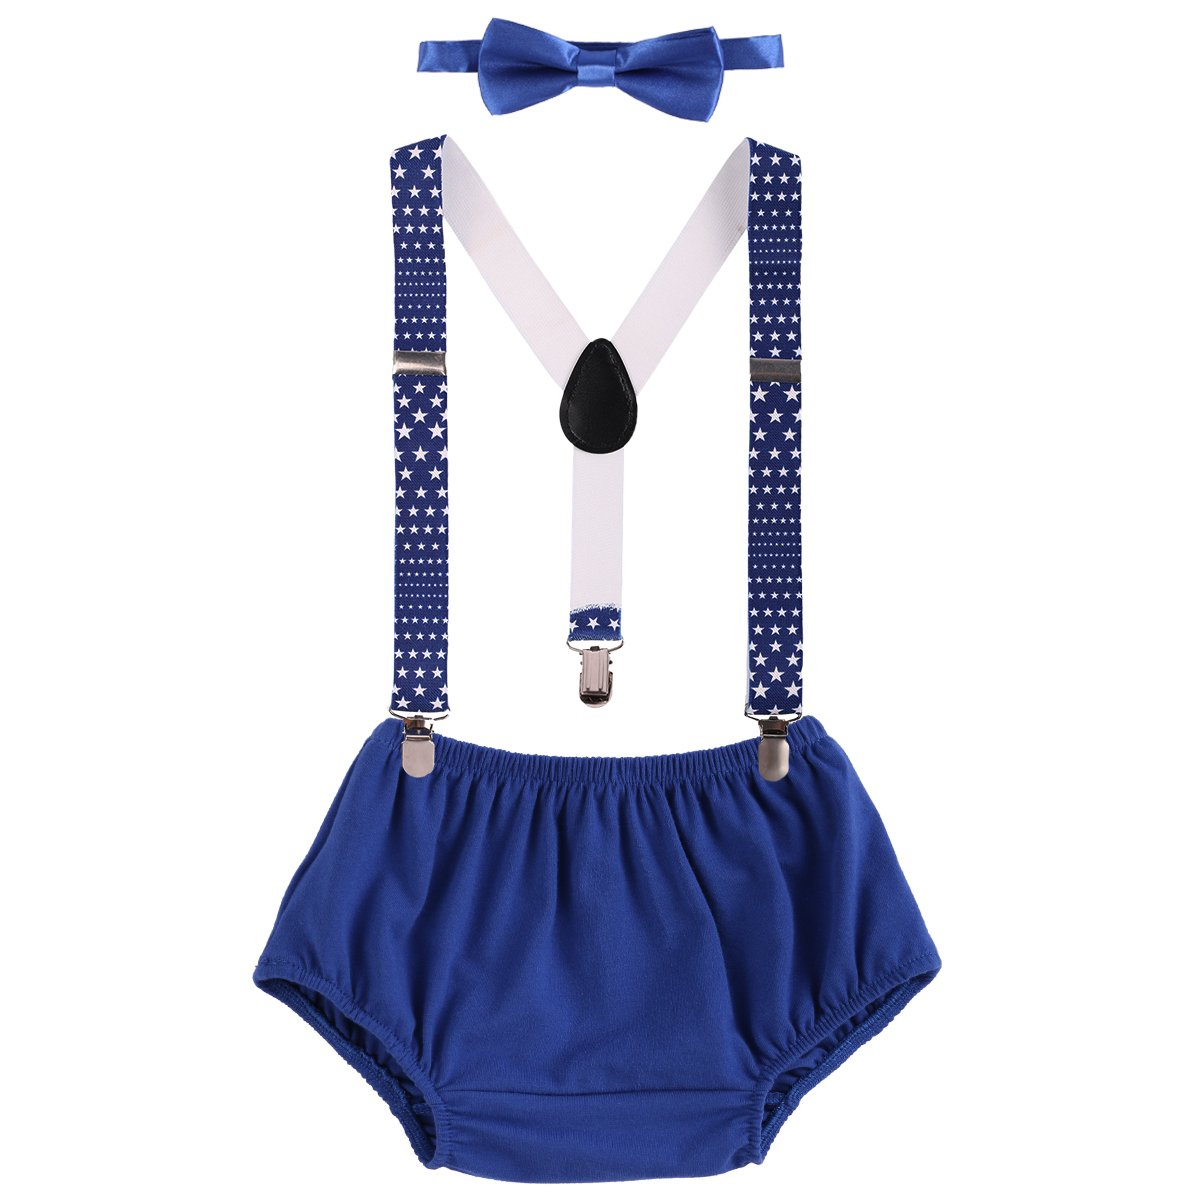 Unisex Suspenders and Bow Tie Set Adjustable Braces Elastic Y-back Baby Kids Hot